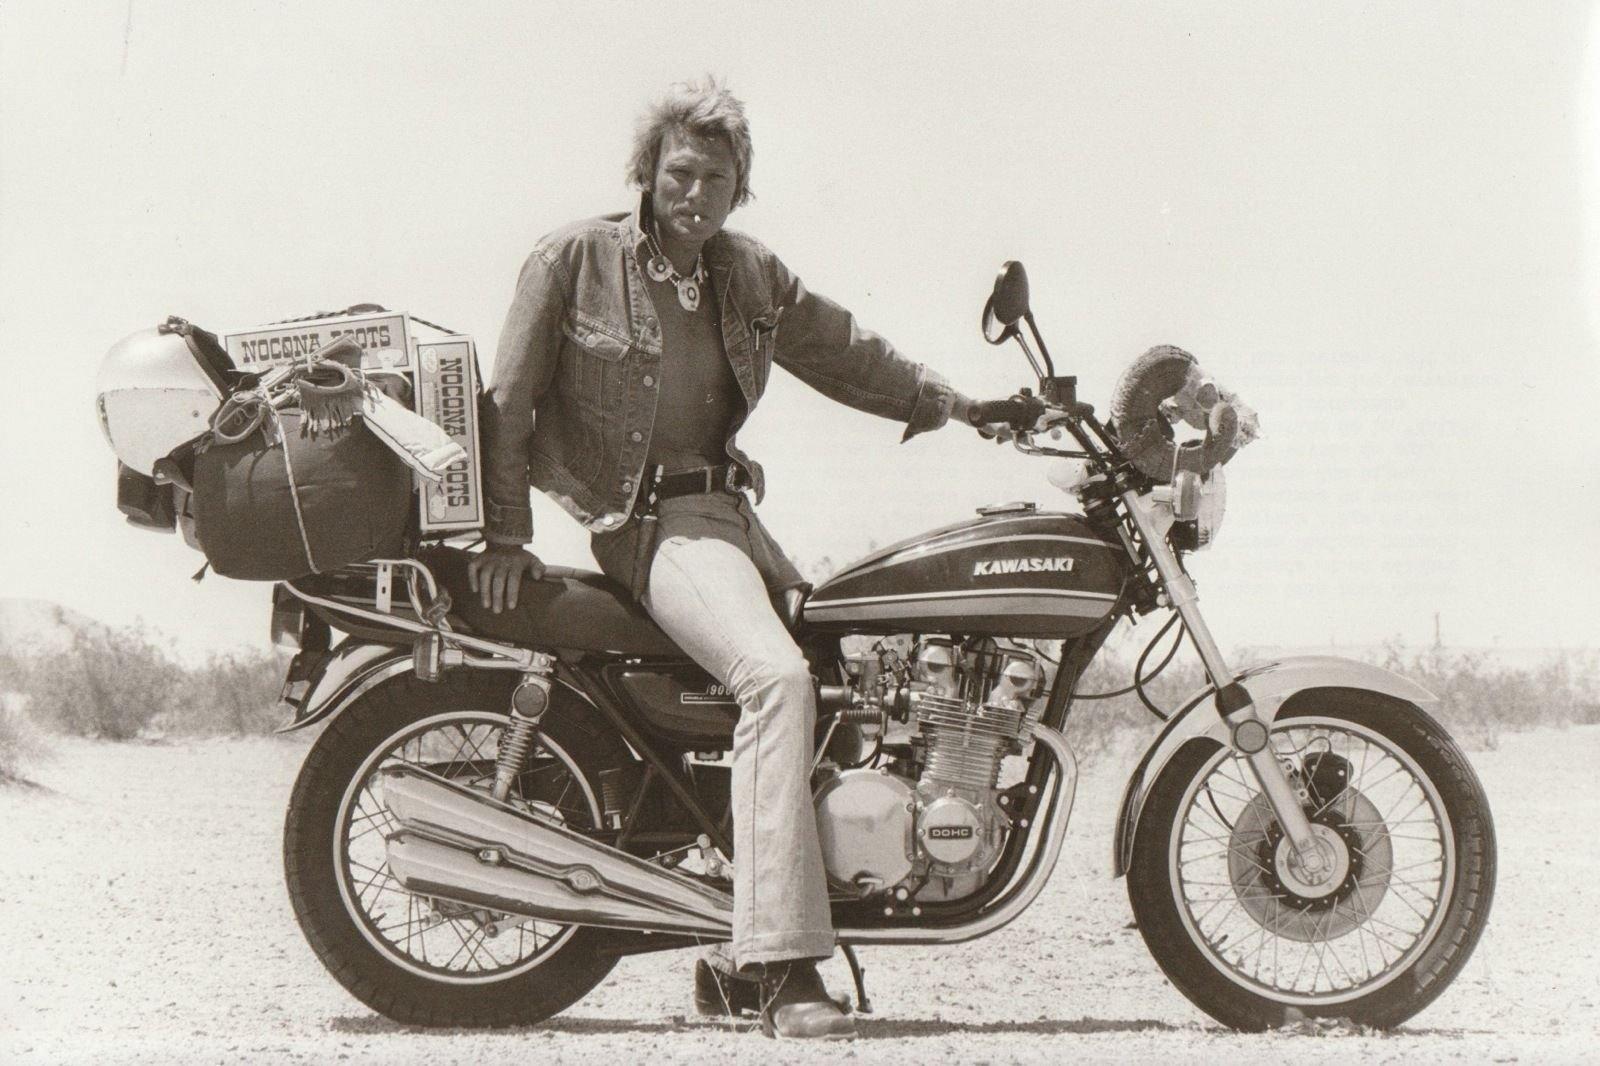 KAWASAKI 900 Z1 DE JOHNNY HALLYDAY ( 1974 ) 201205081948607480